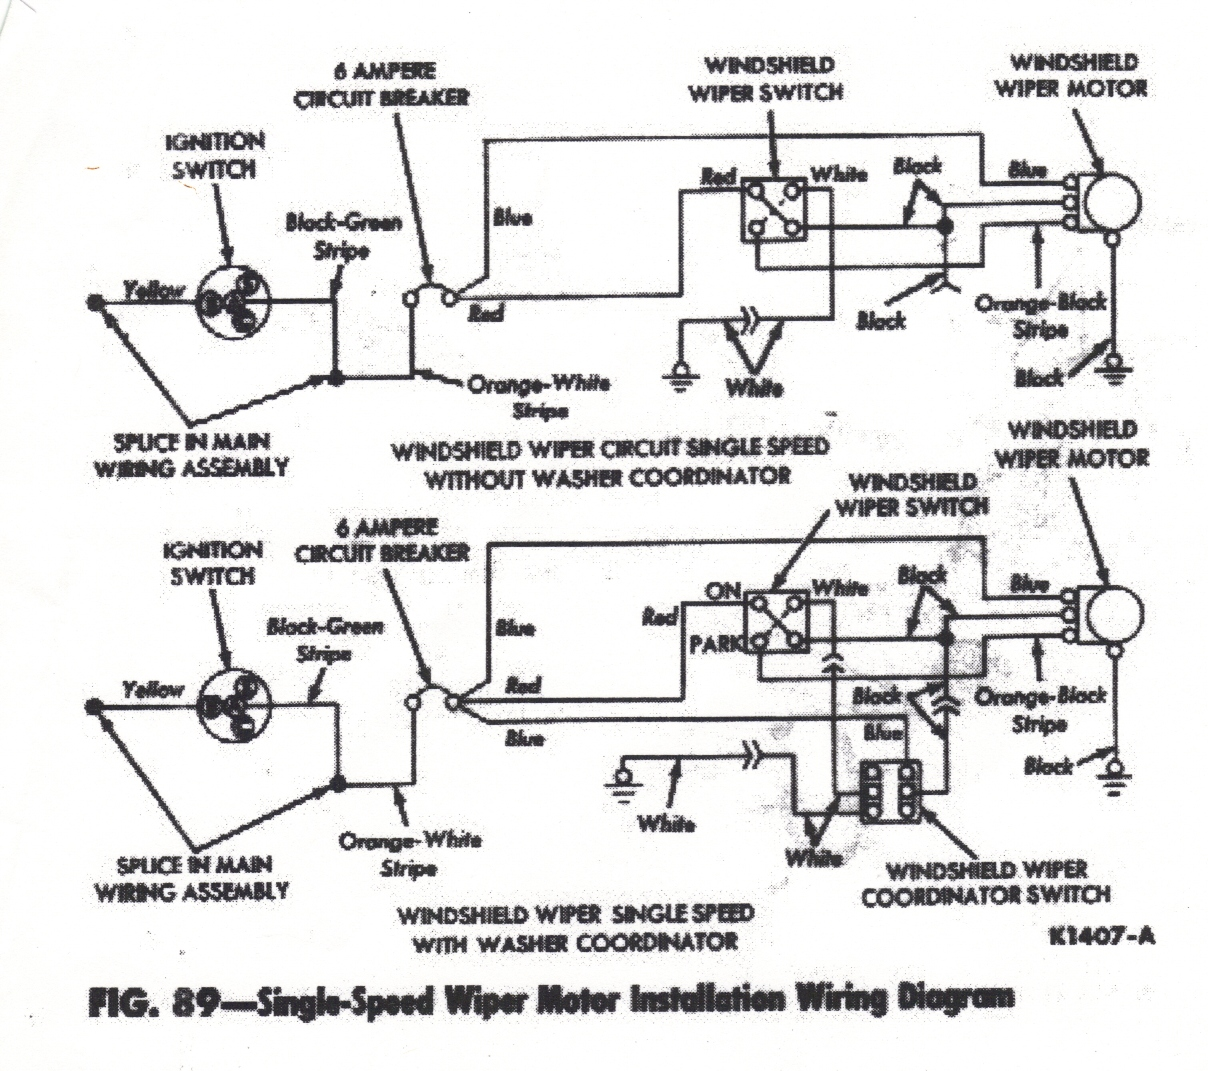 1963 impala wiper motor wiring diagram gm trailer hitch falcon diagrams